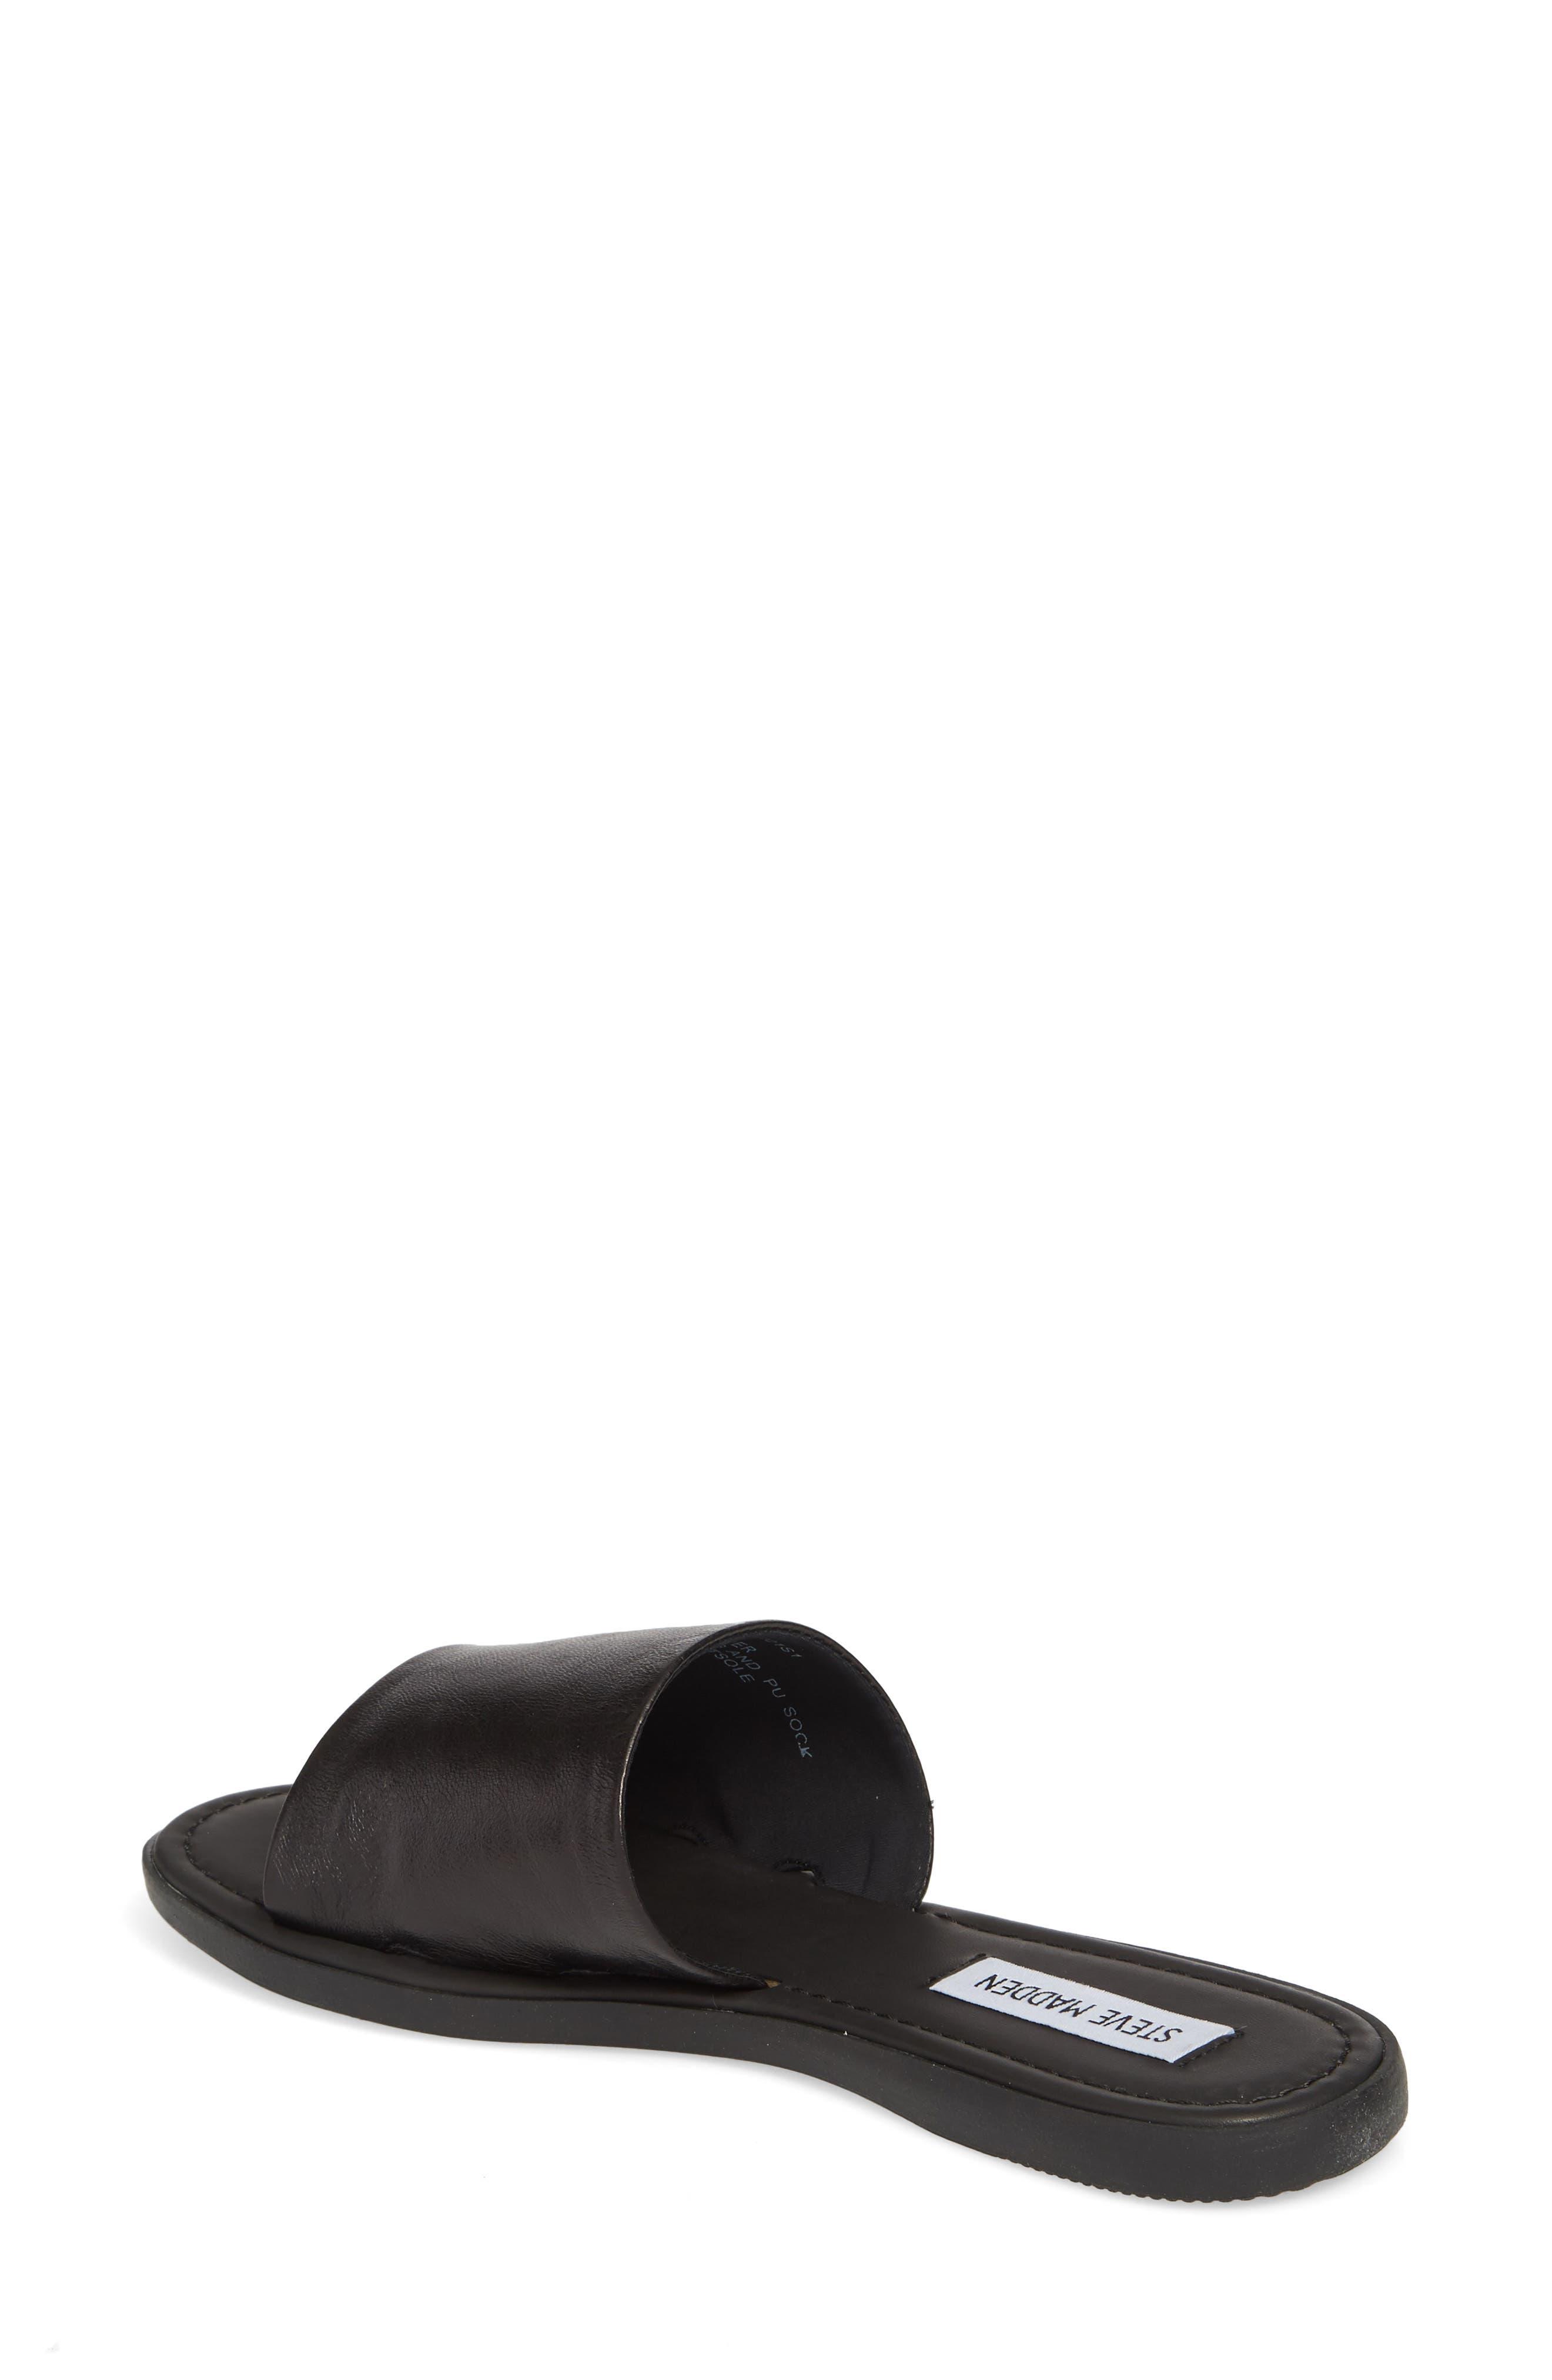 Camilla Slide Sandal,                             Alternate thumbnail 2, color,                             Black Leather